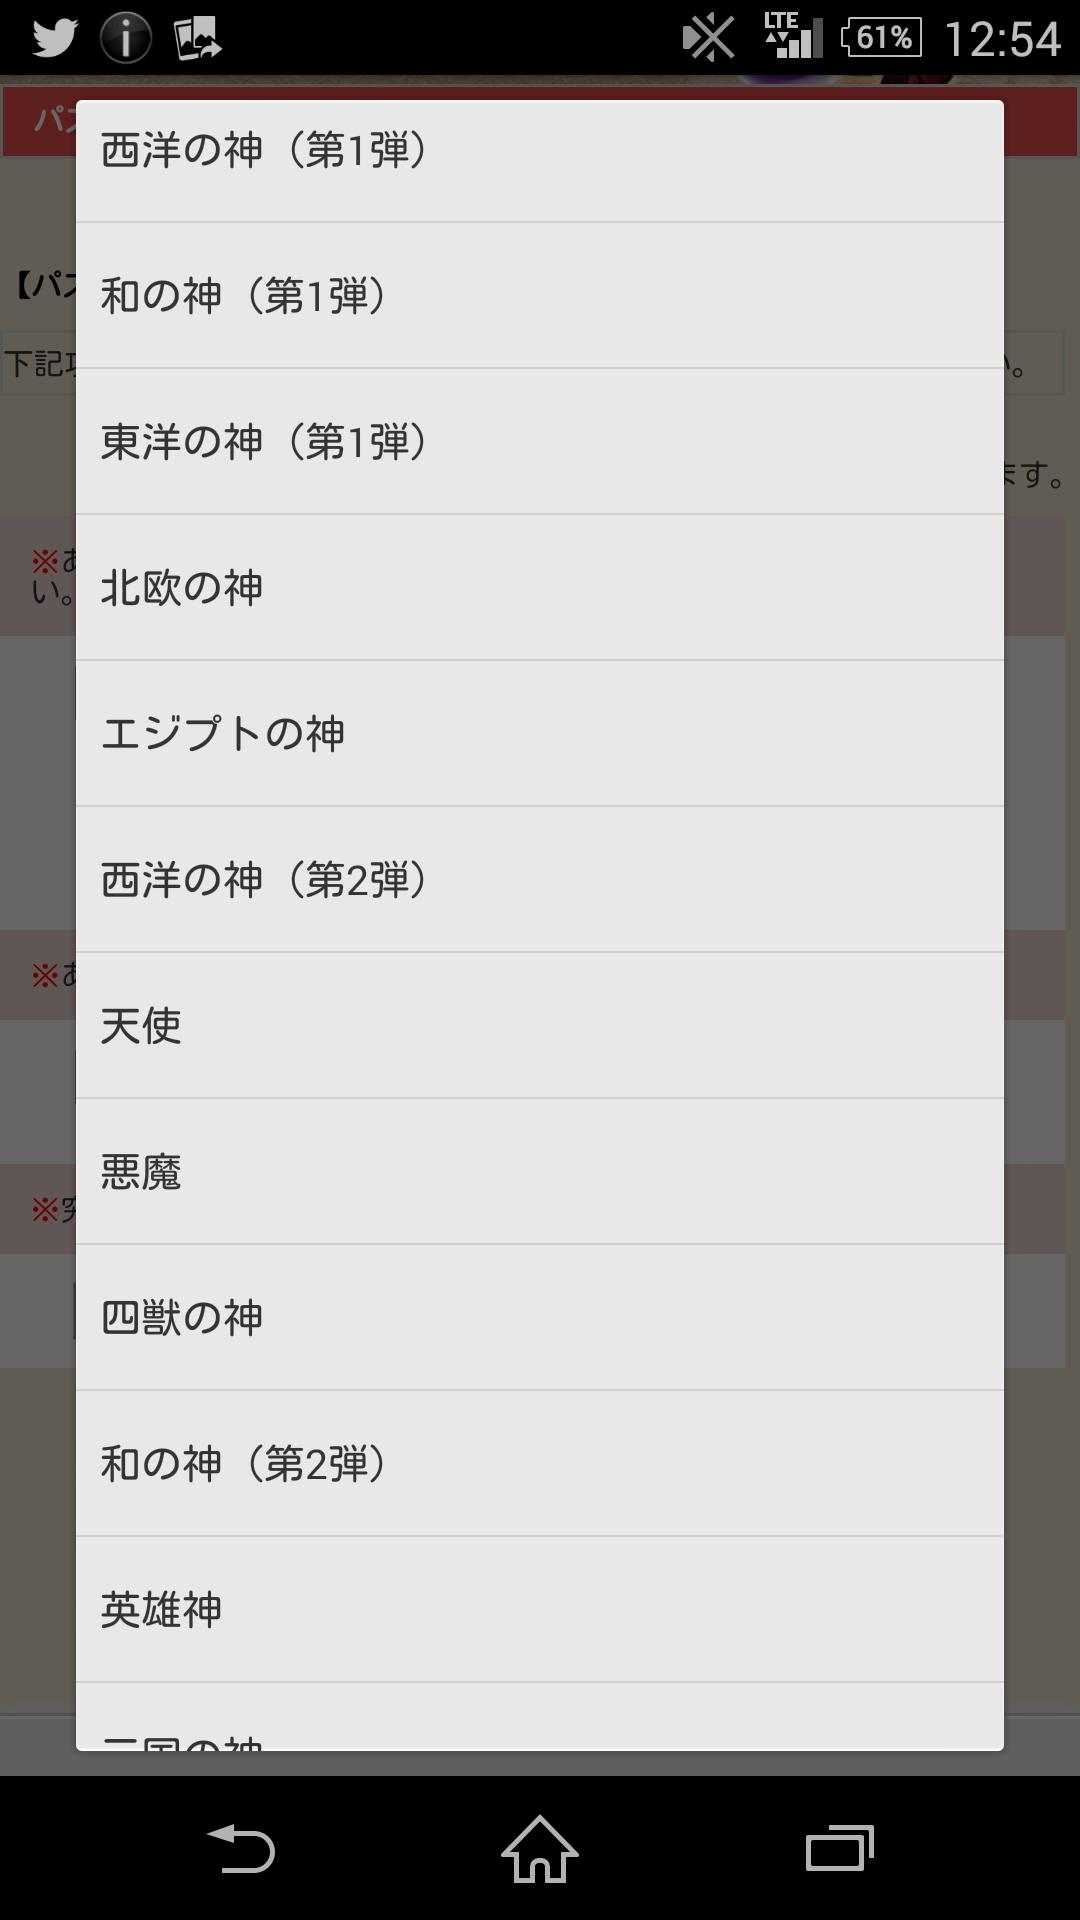 Screenshot_2014-09-16-12-54-19.png